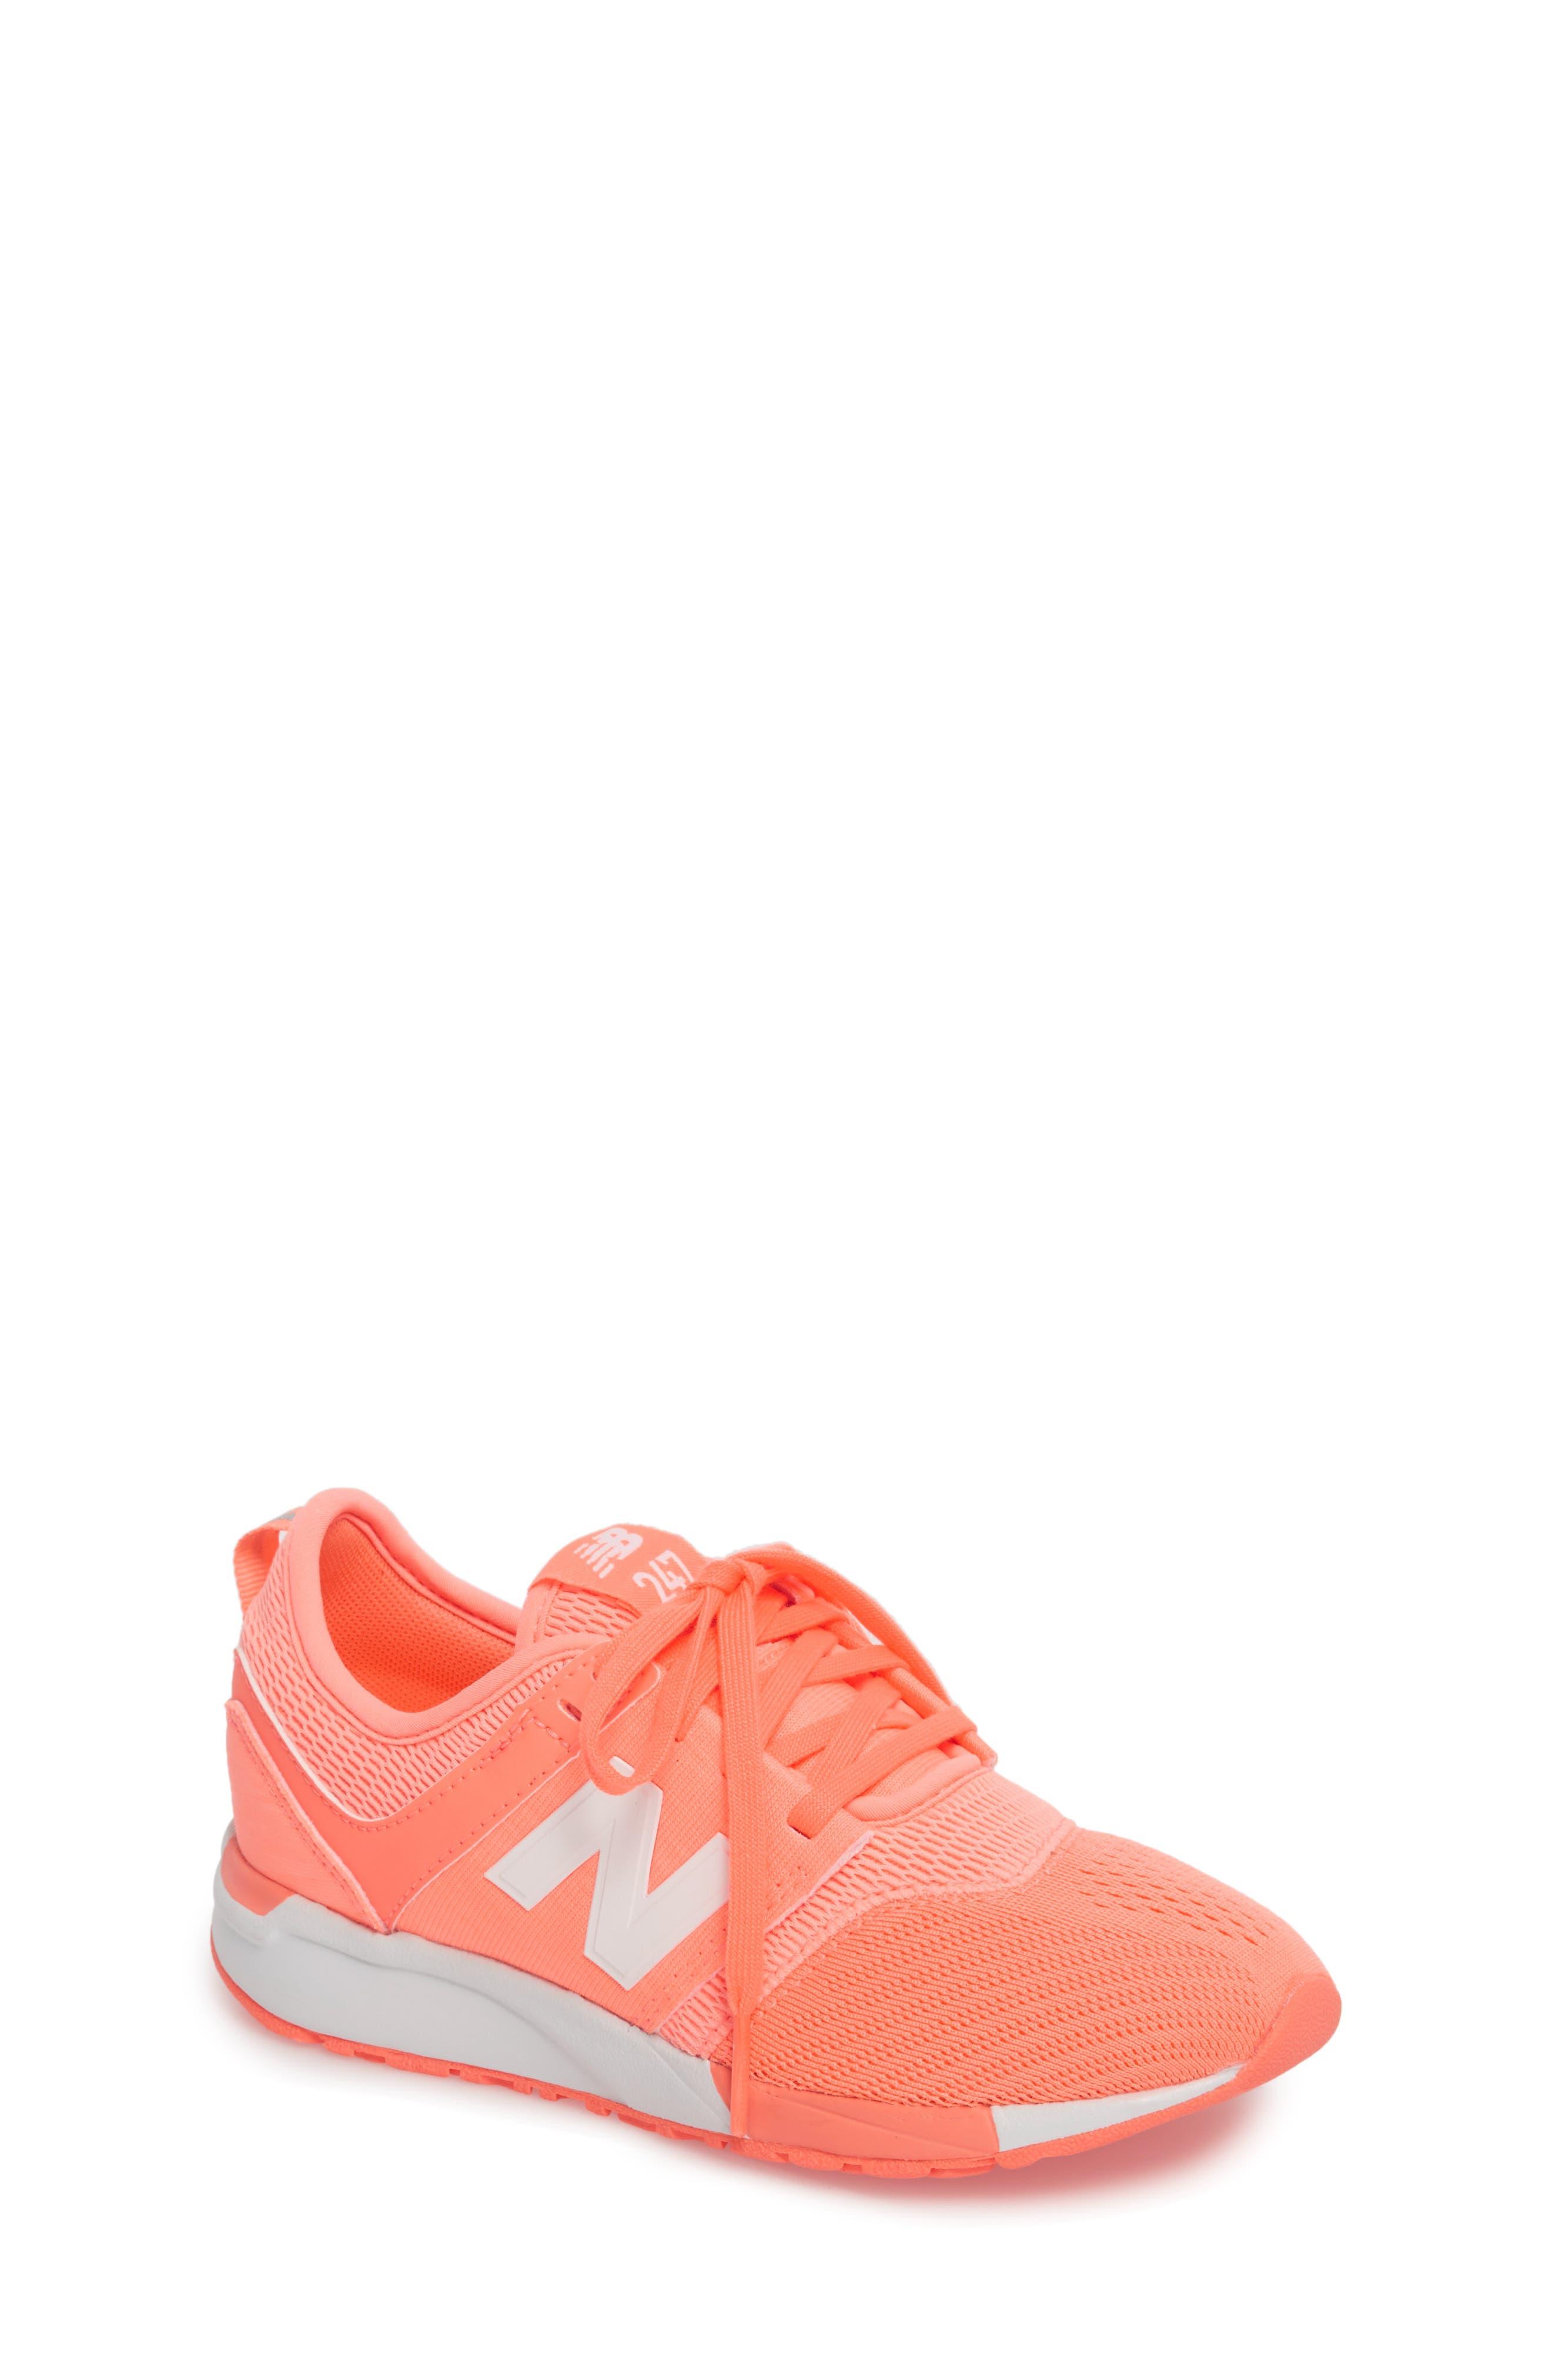 247 Sport Sneaker,                             Main thumbnail 1, color,                             653